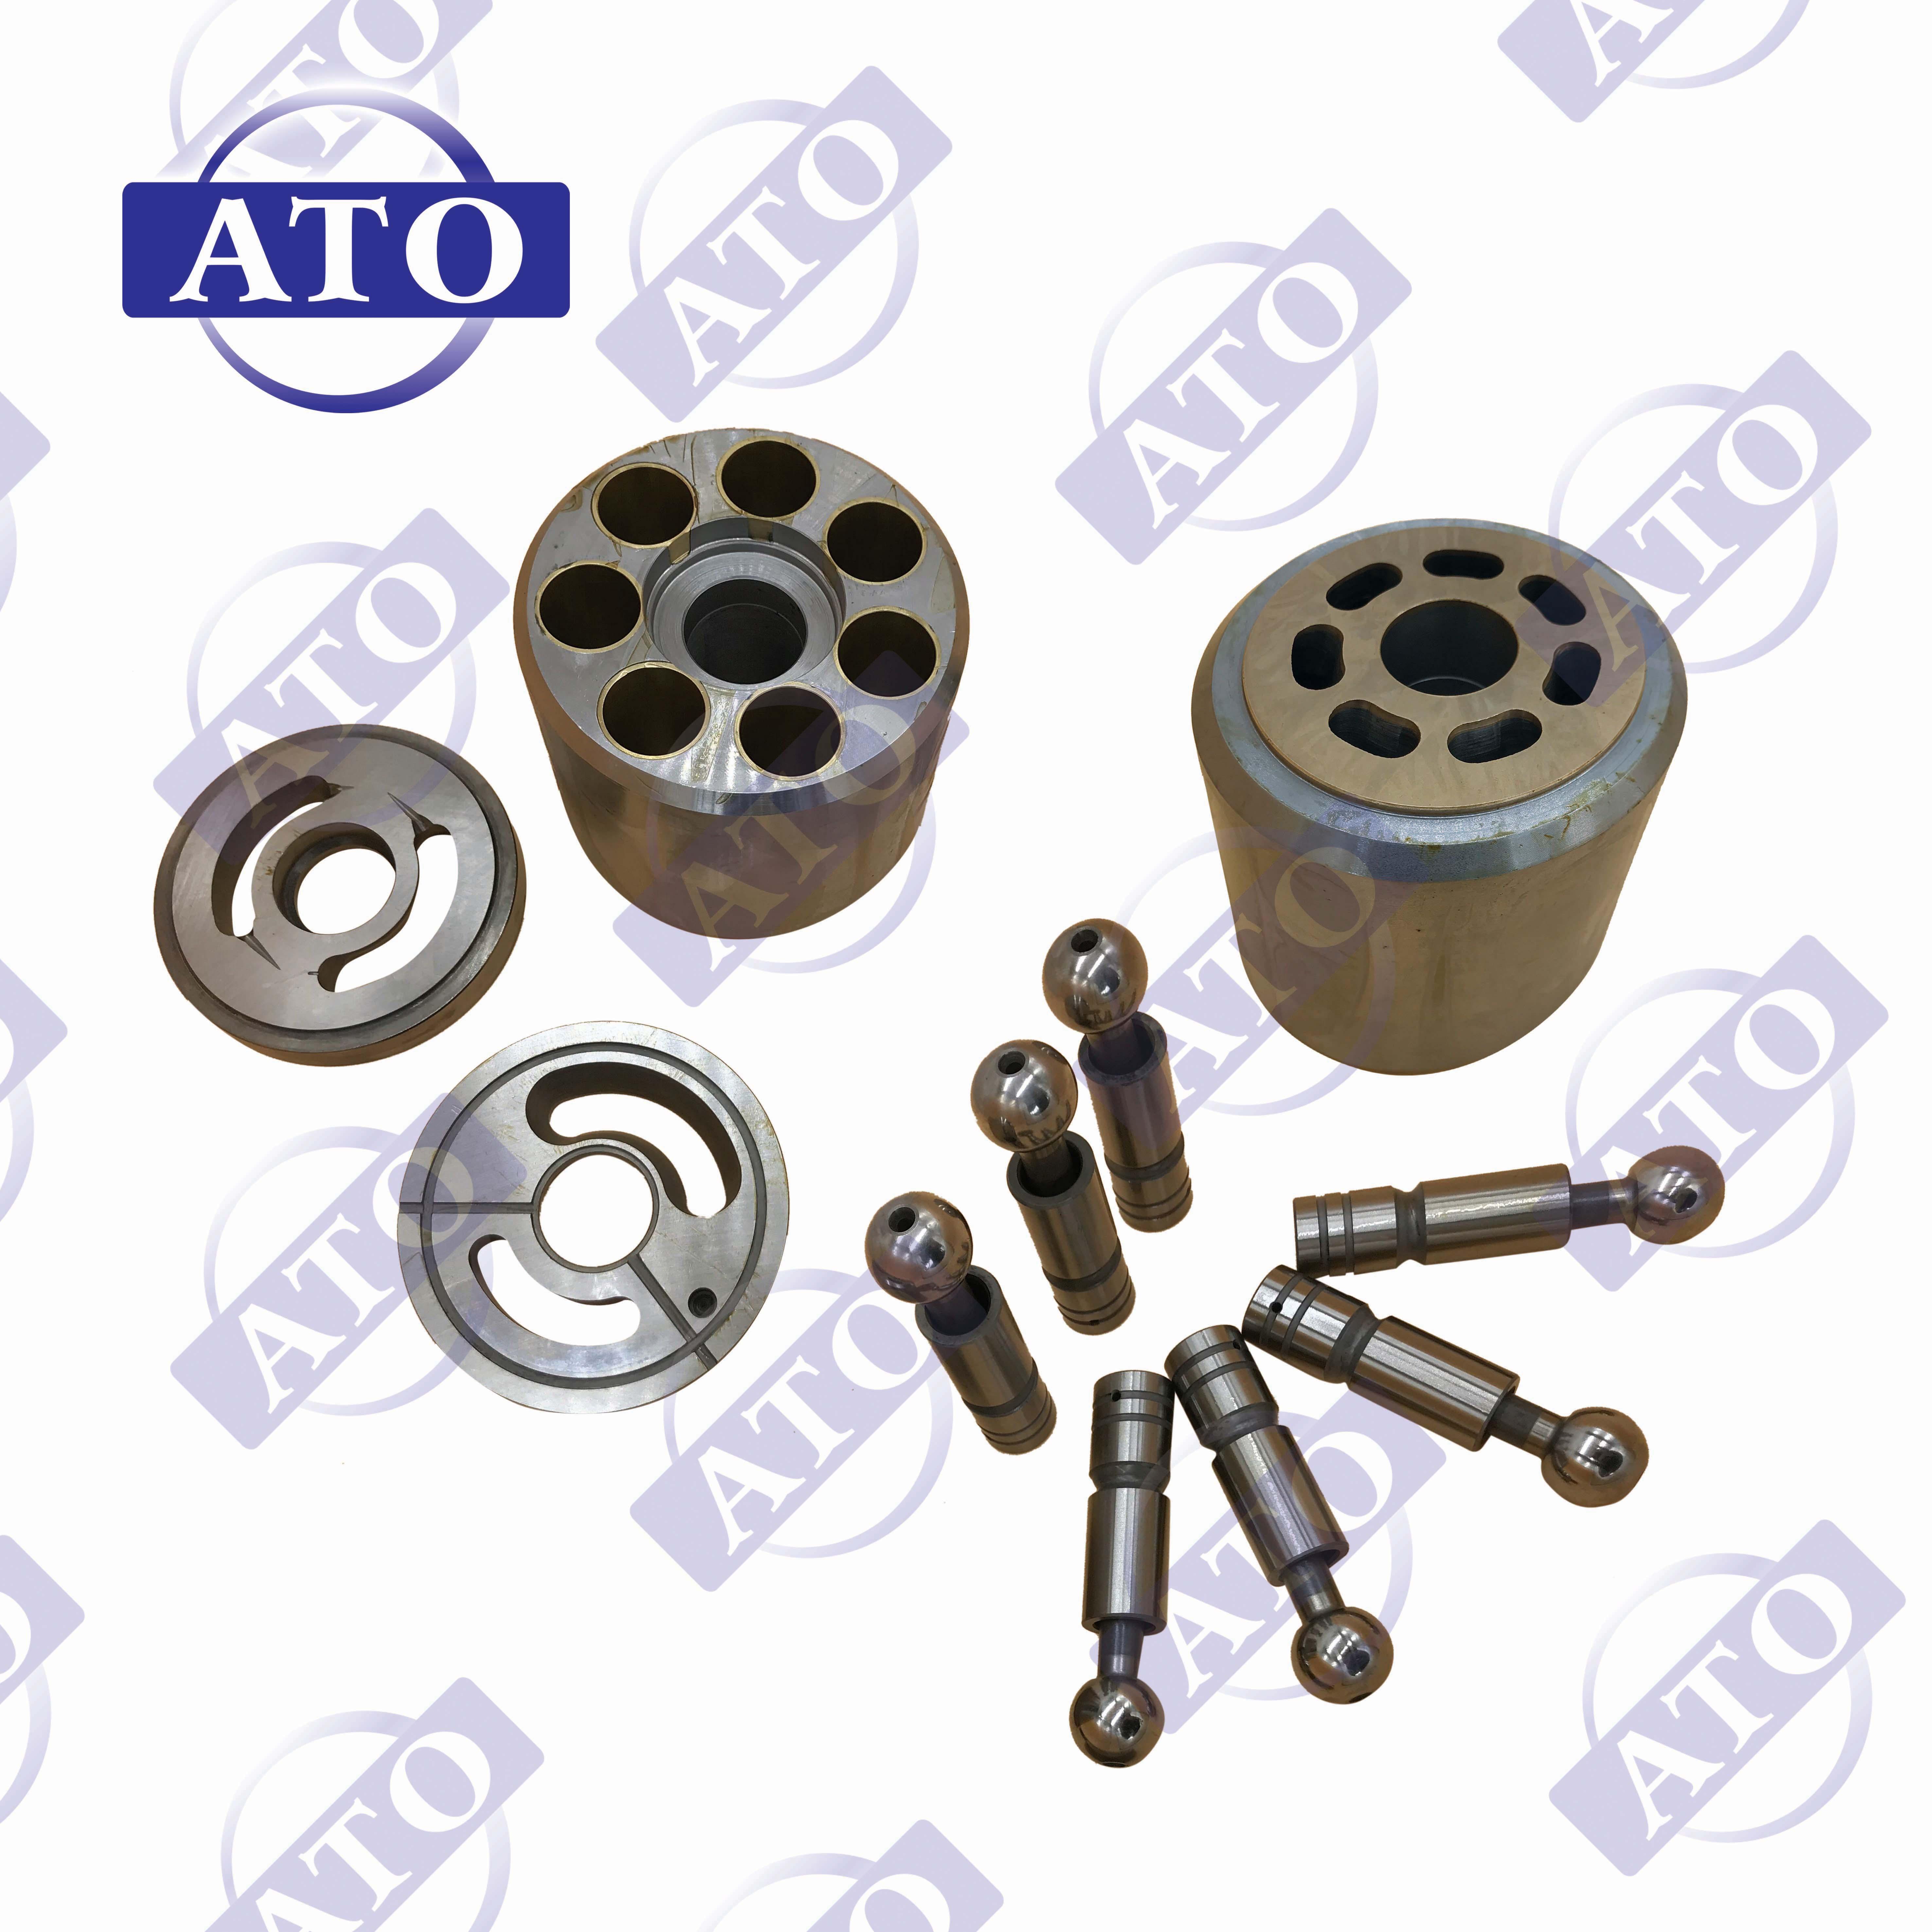 EXCAVATOR,BULLDOZER,COMPACTOR,CRANE,LOADER,HARVESTER Hydraulic piston pump parts for LINDE B2PV50